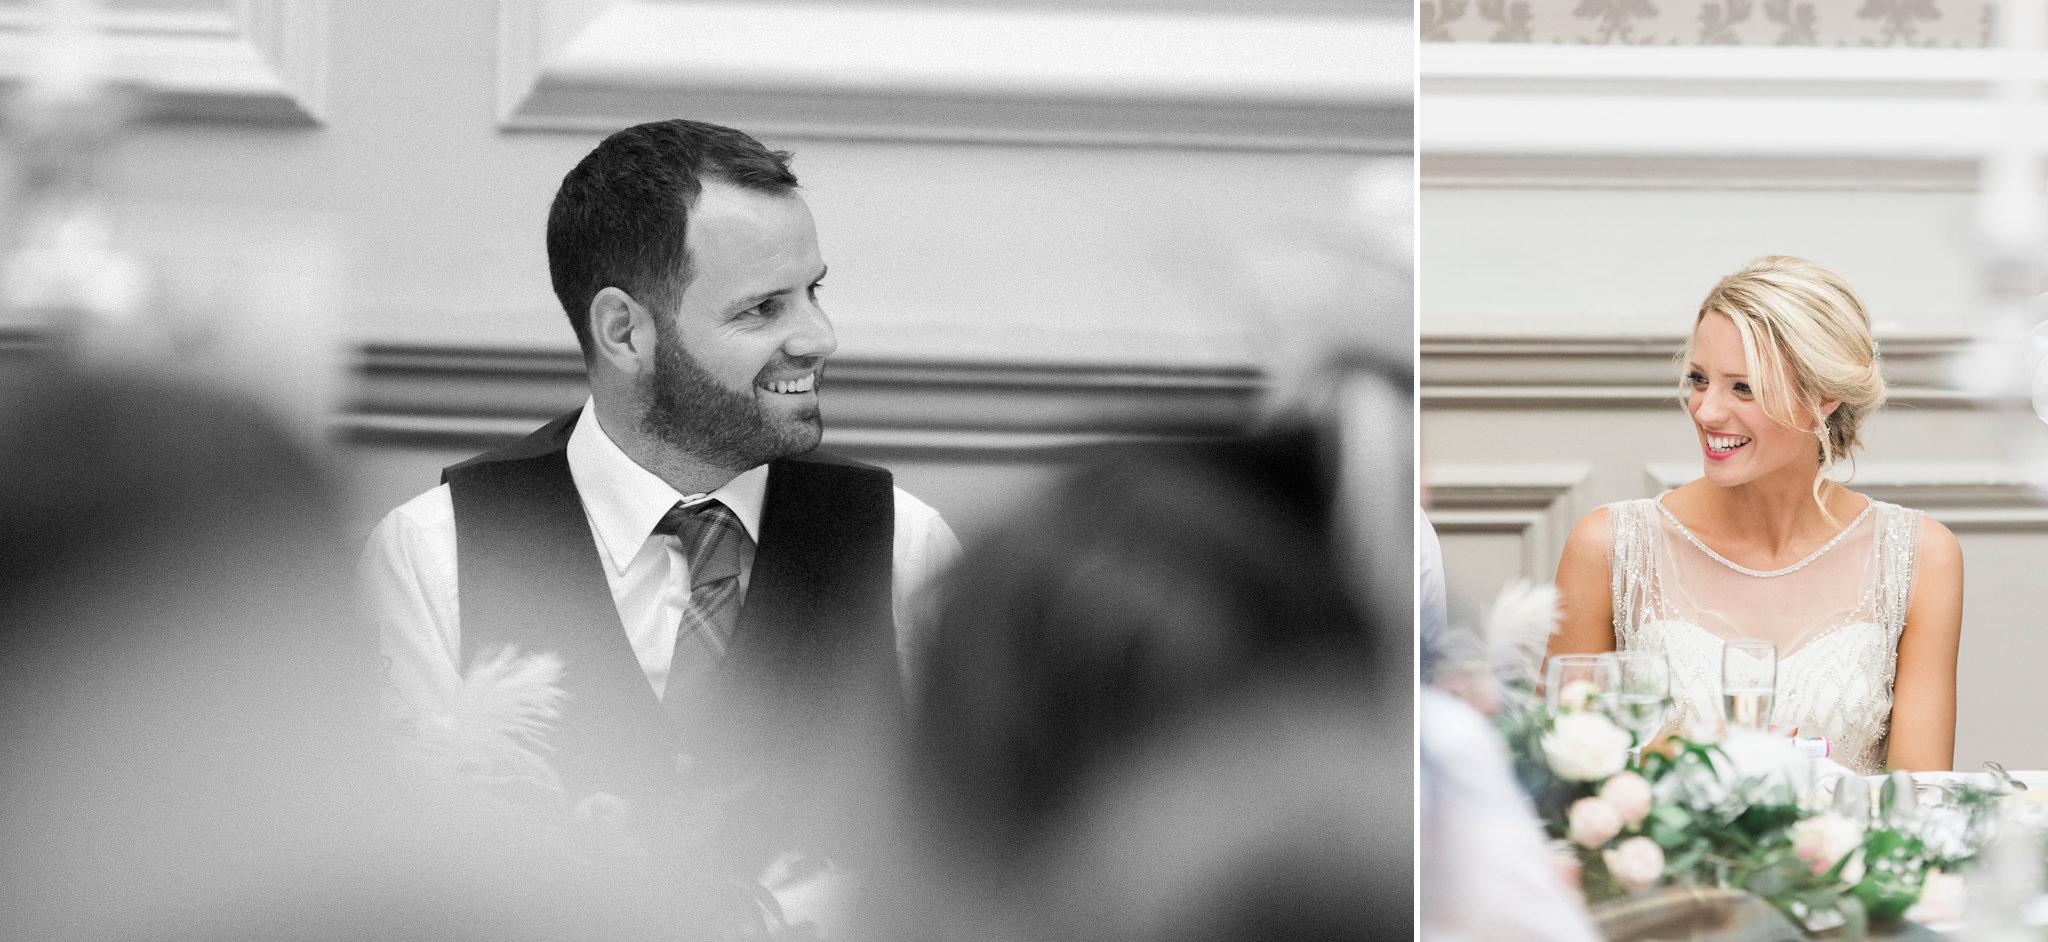 109-destination-wedding-photography.jpg